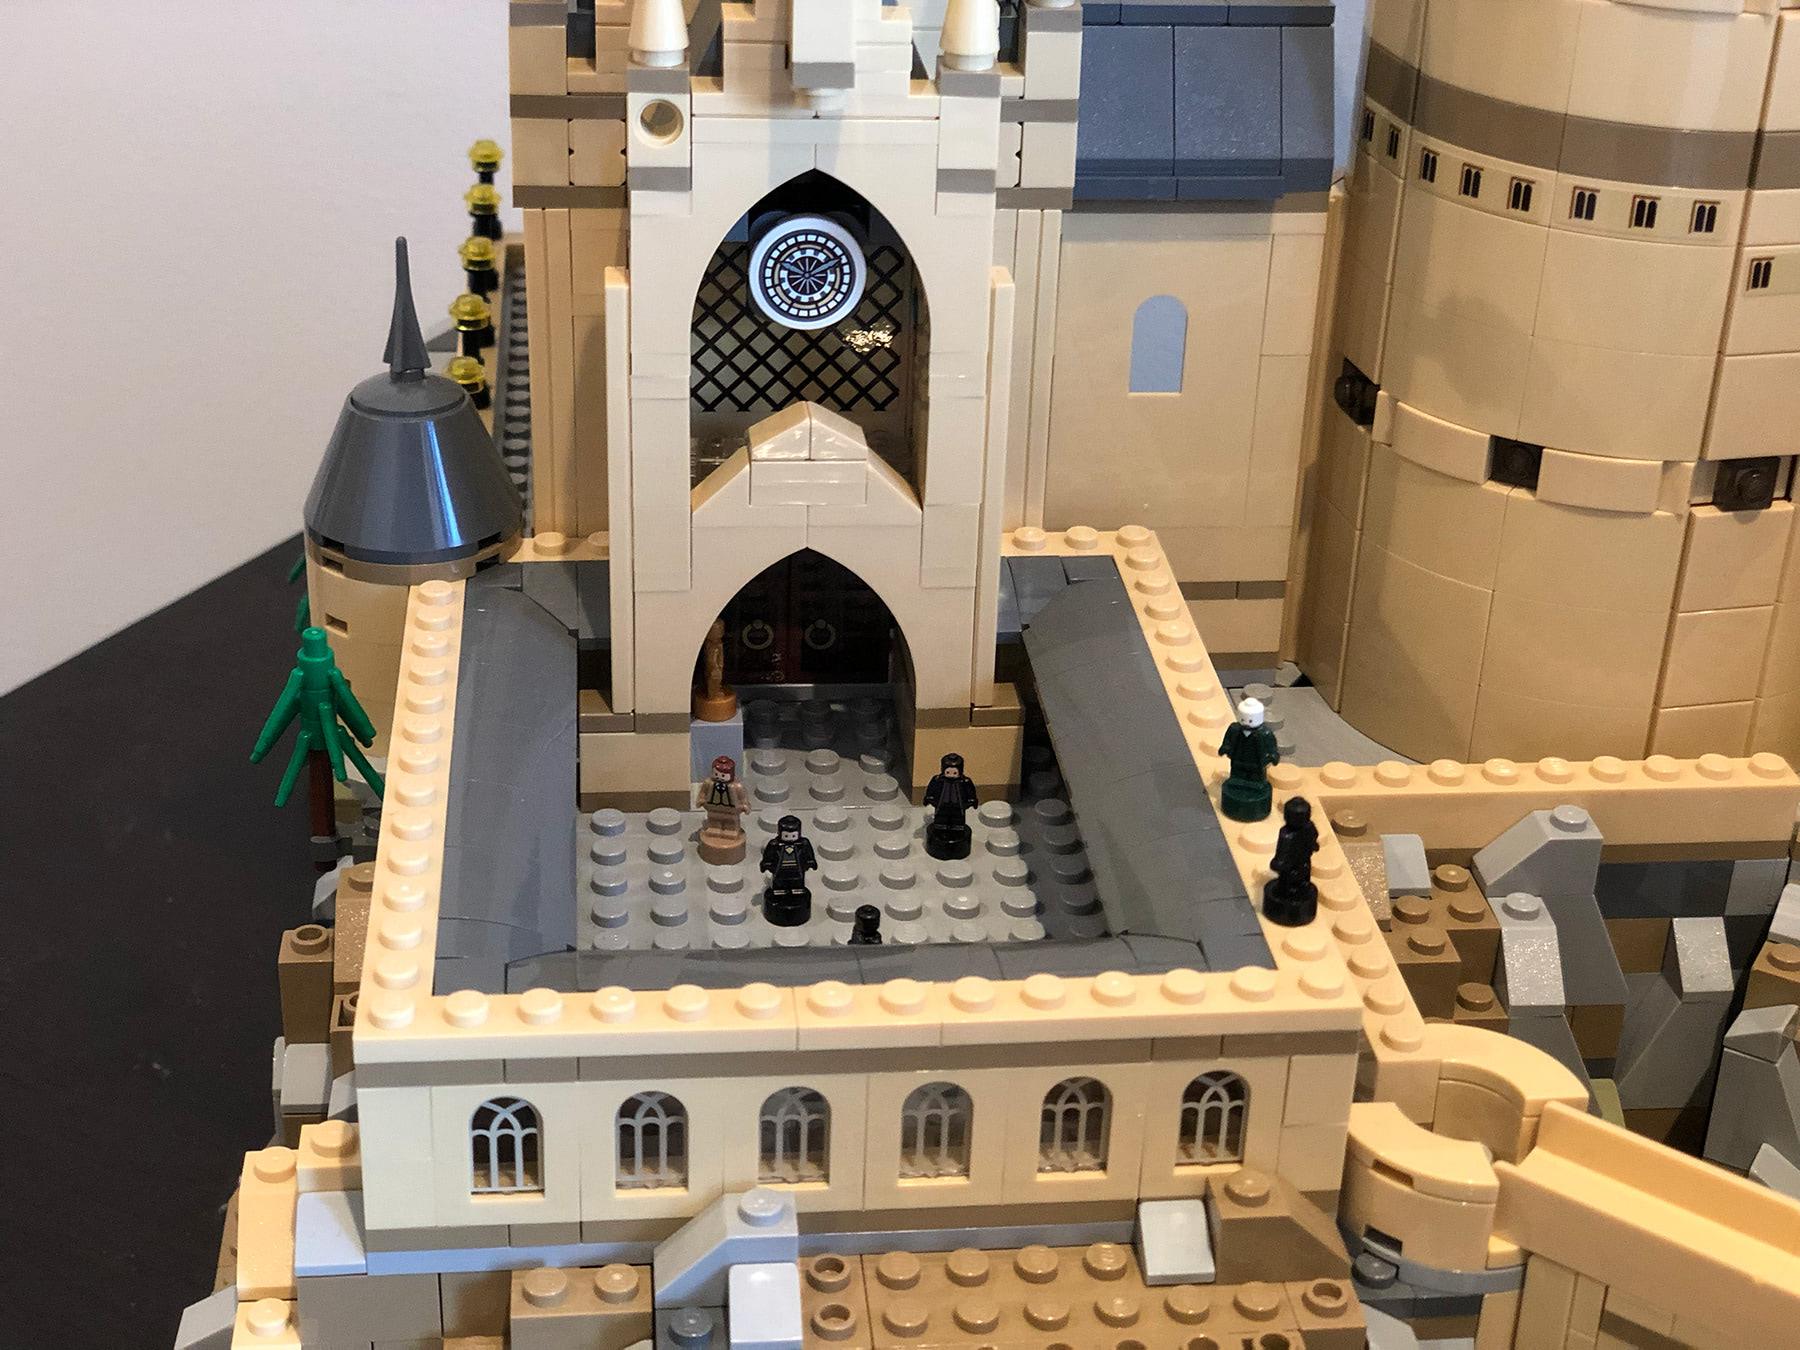 LEGO Hogwarts Castle (71043) courtyard